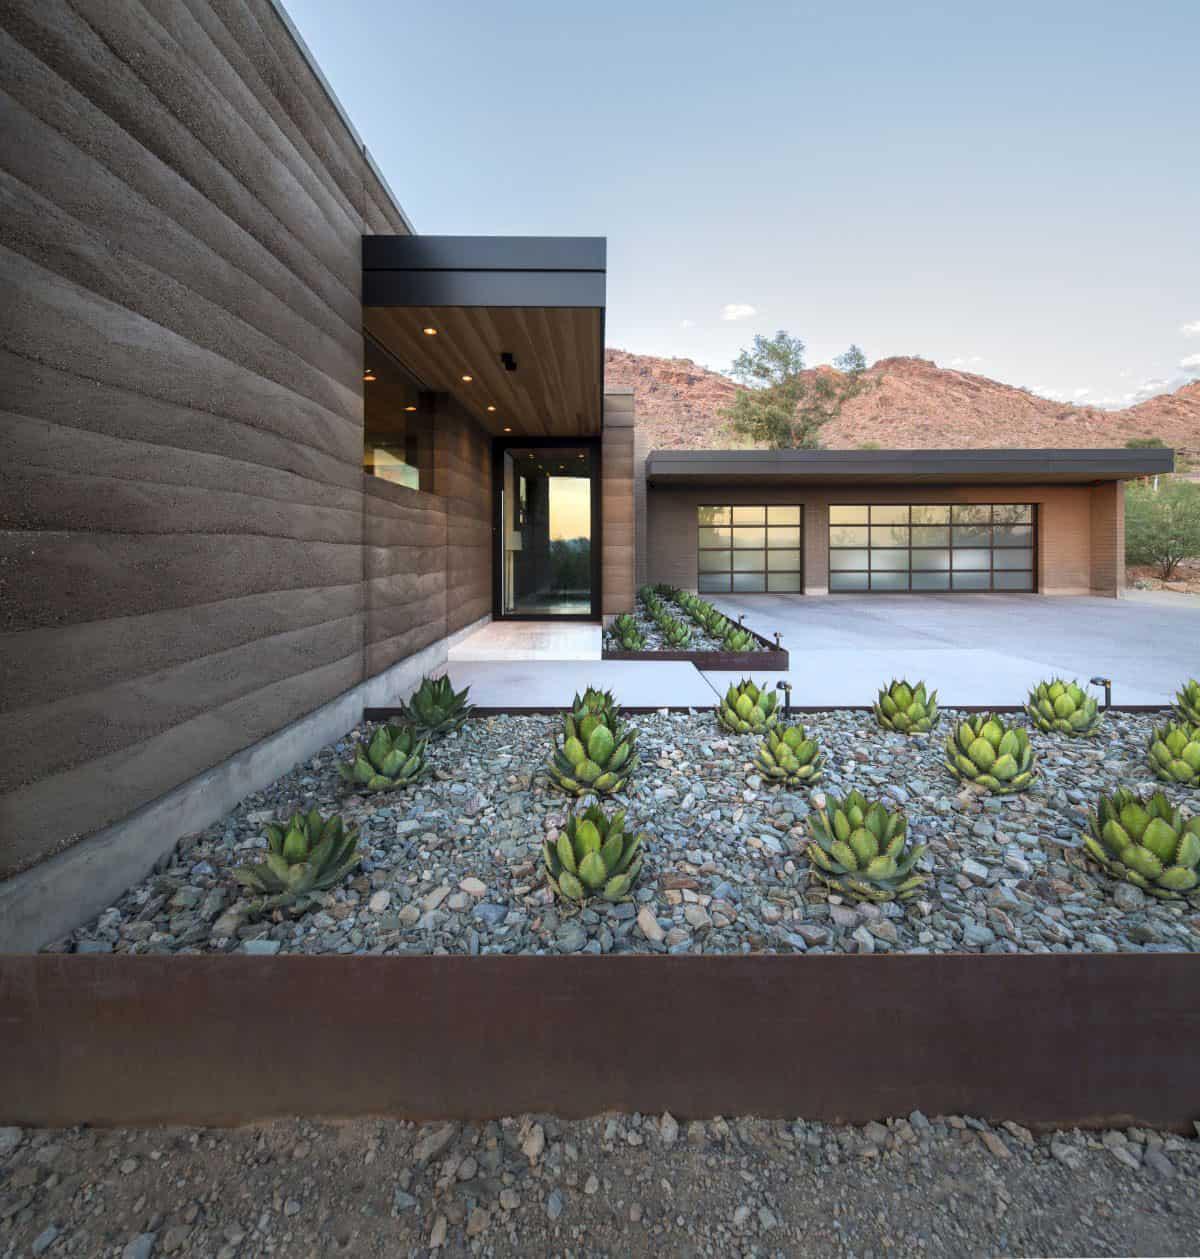 Quartz Mountain Residence by Kendle Design Collaborative (2)